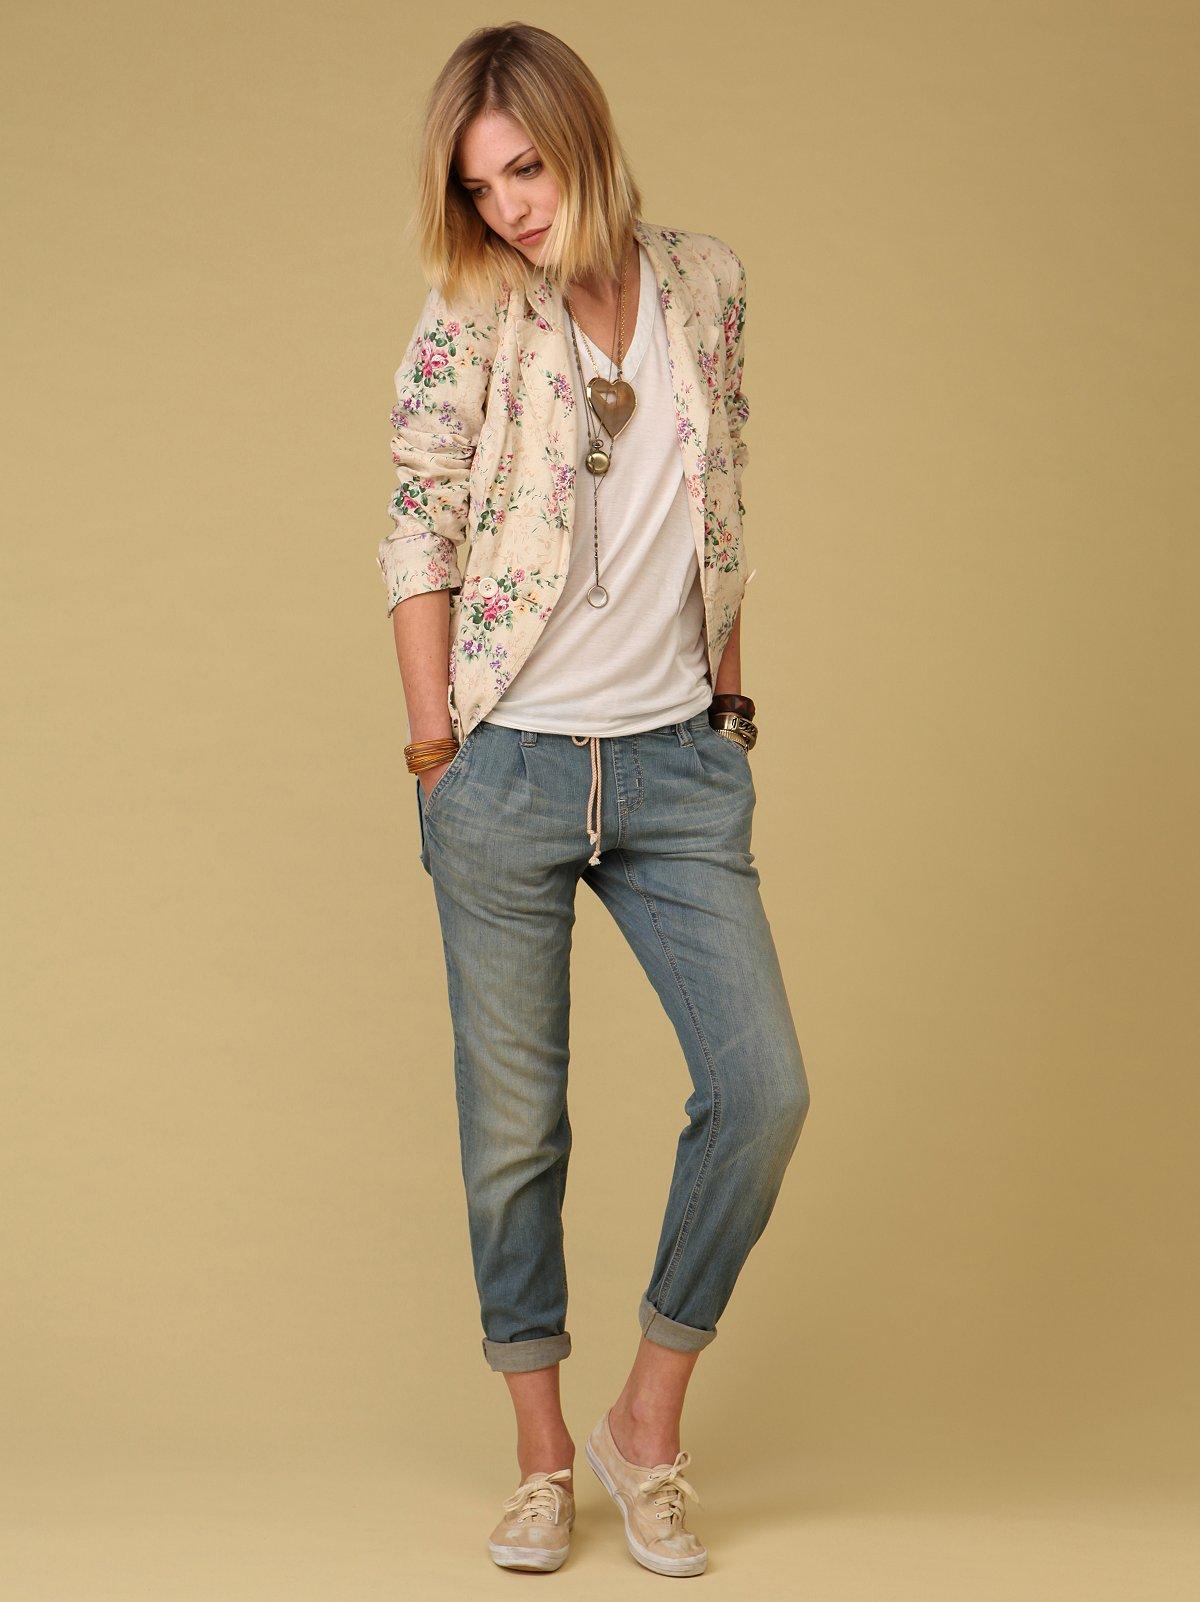 FP Knit Waistband Jean